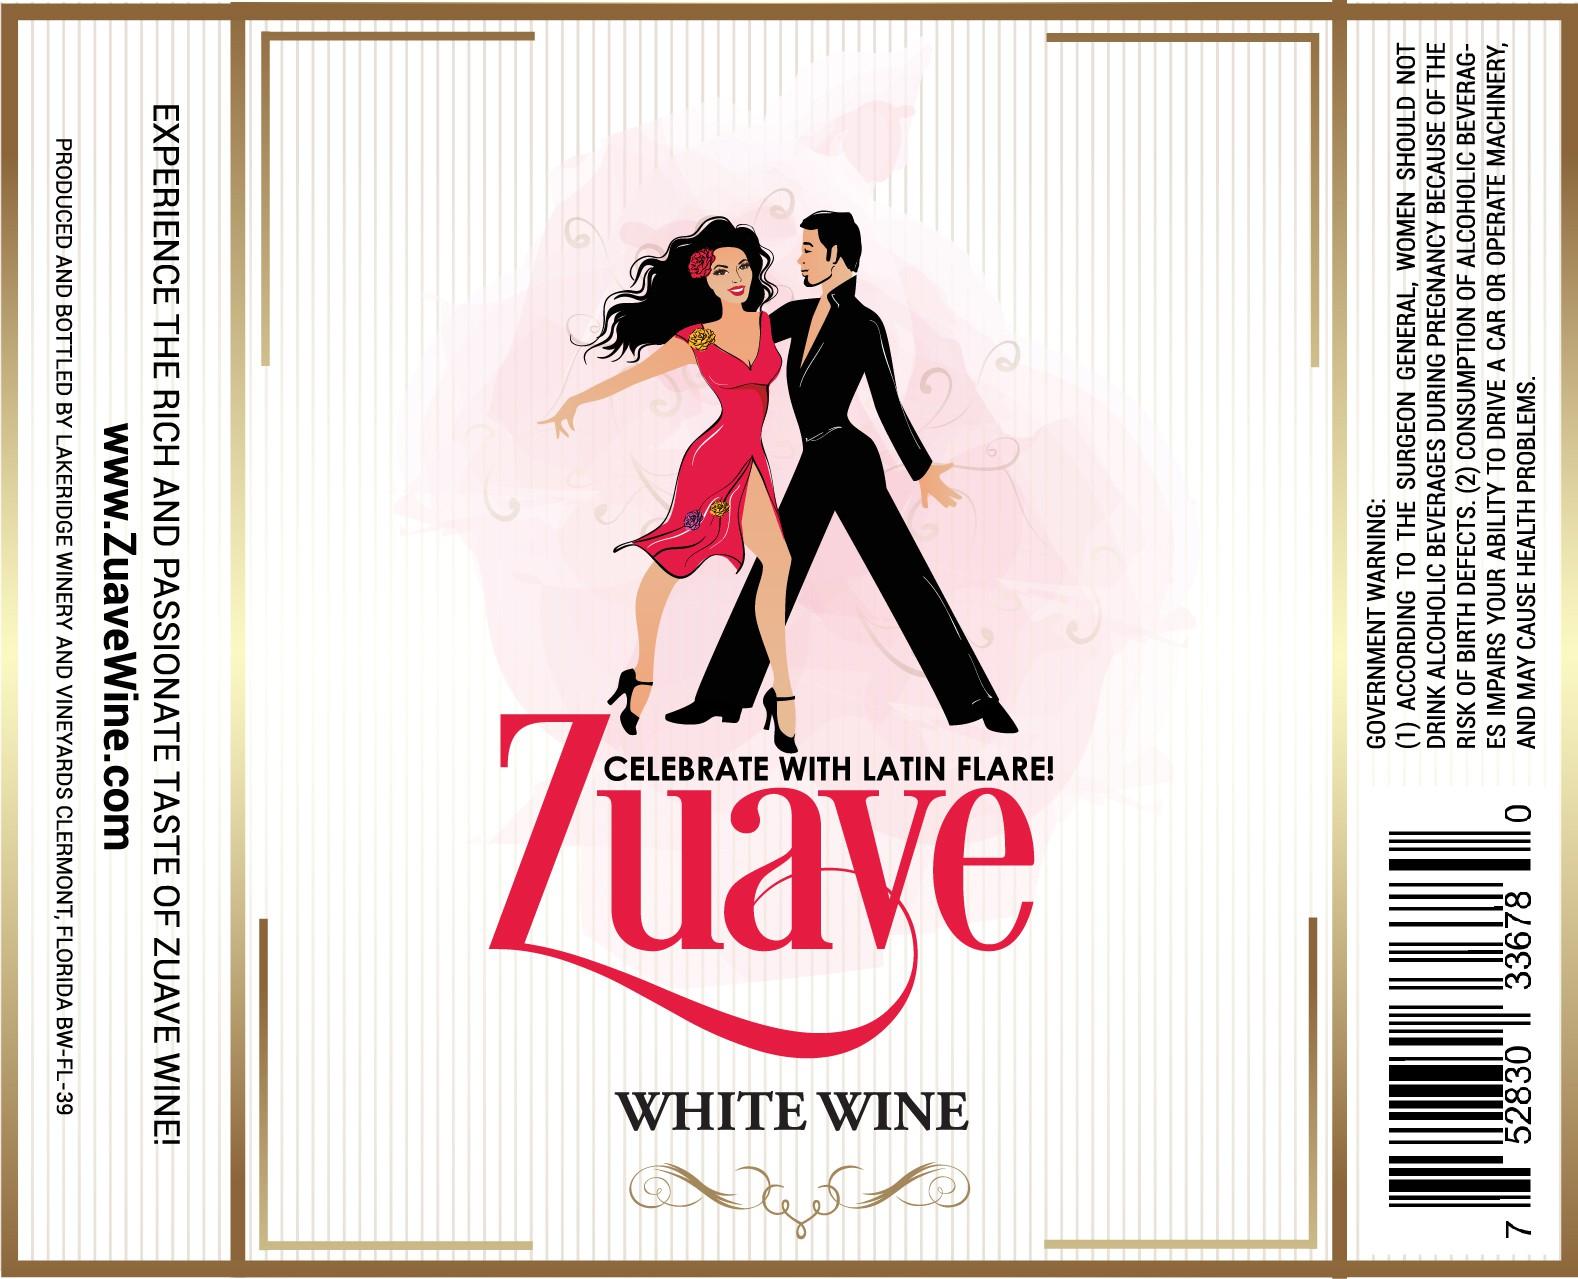 Zuave Wine Label Refinements